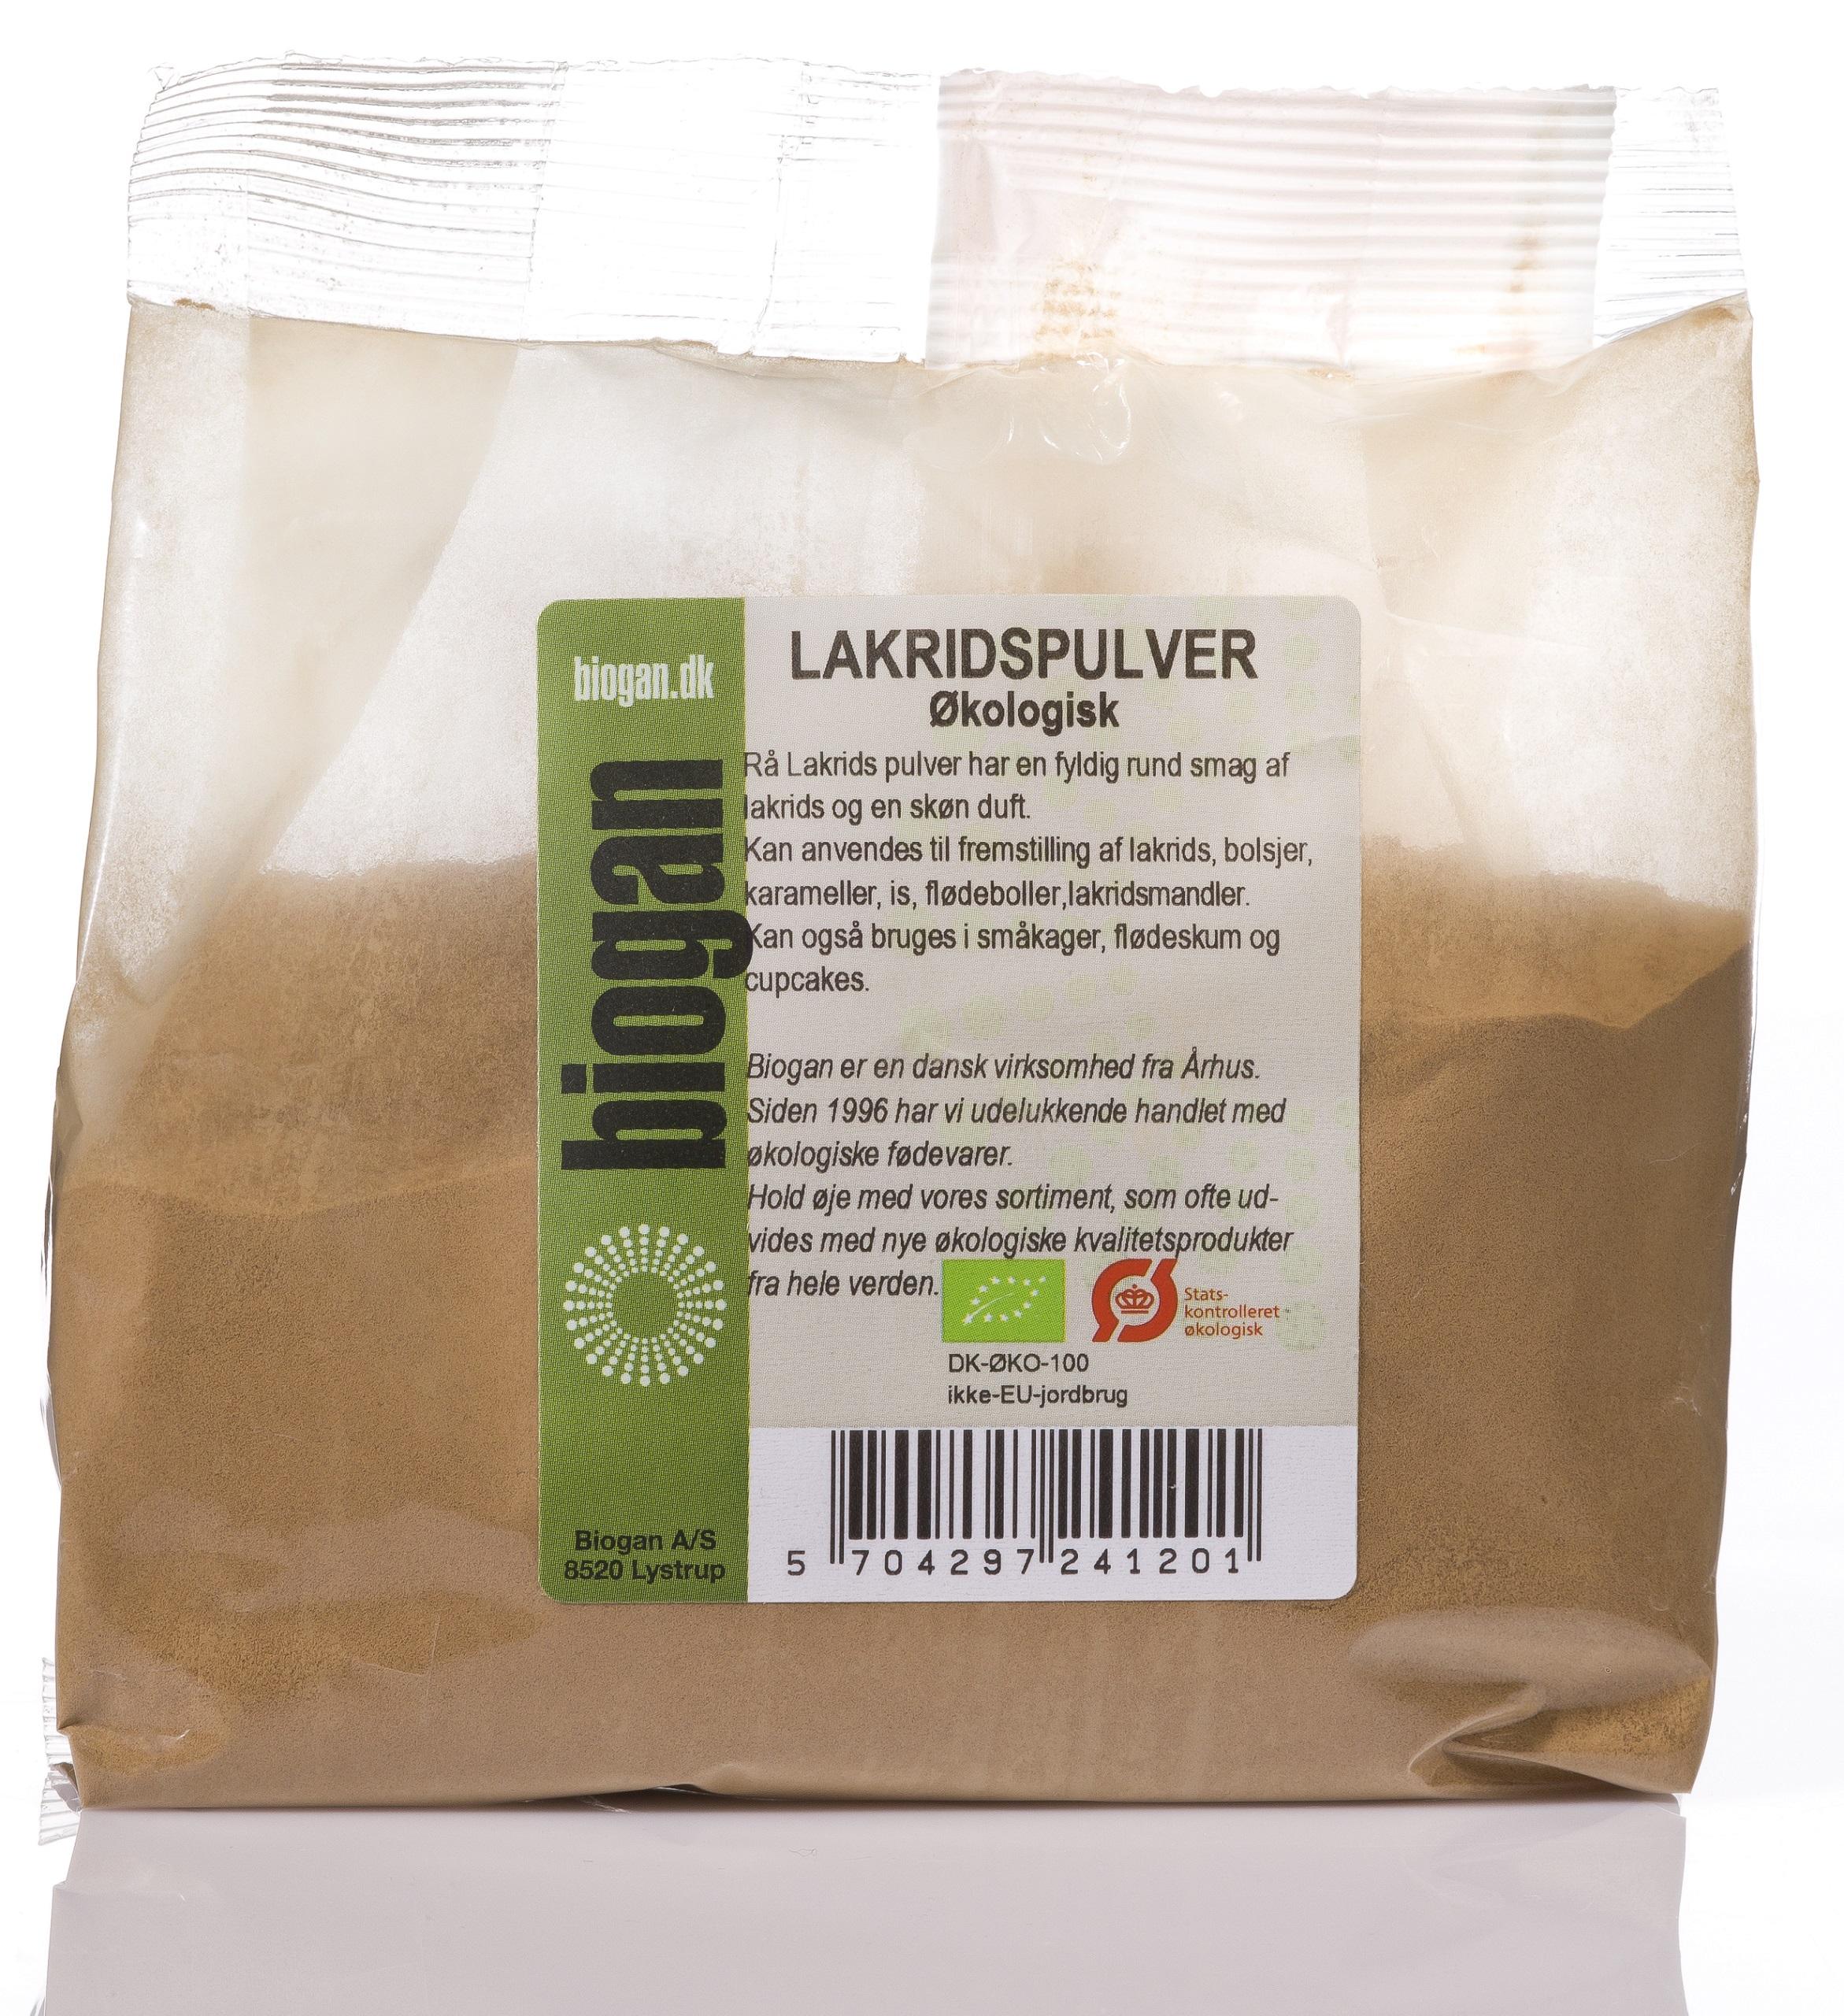 Biogan lakridspulver fra Mecindo